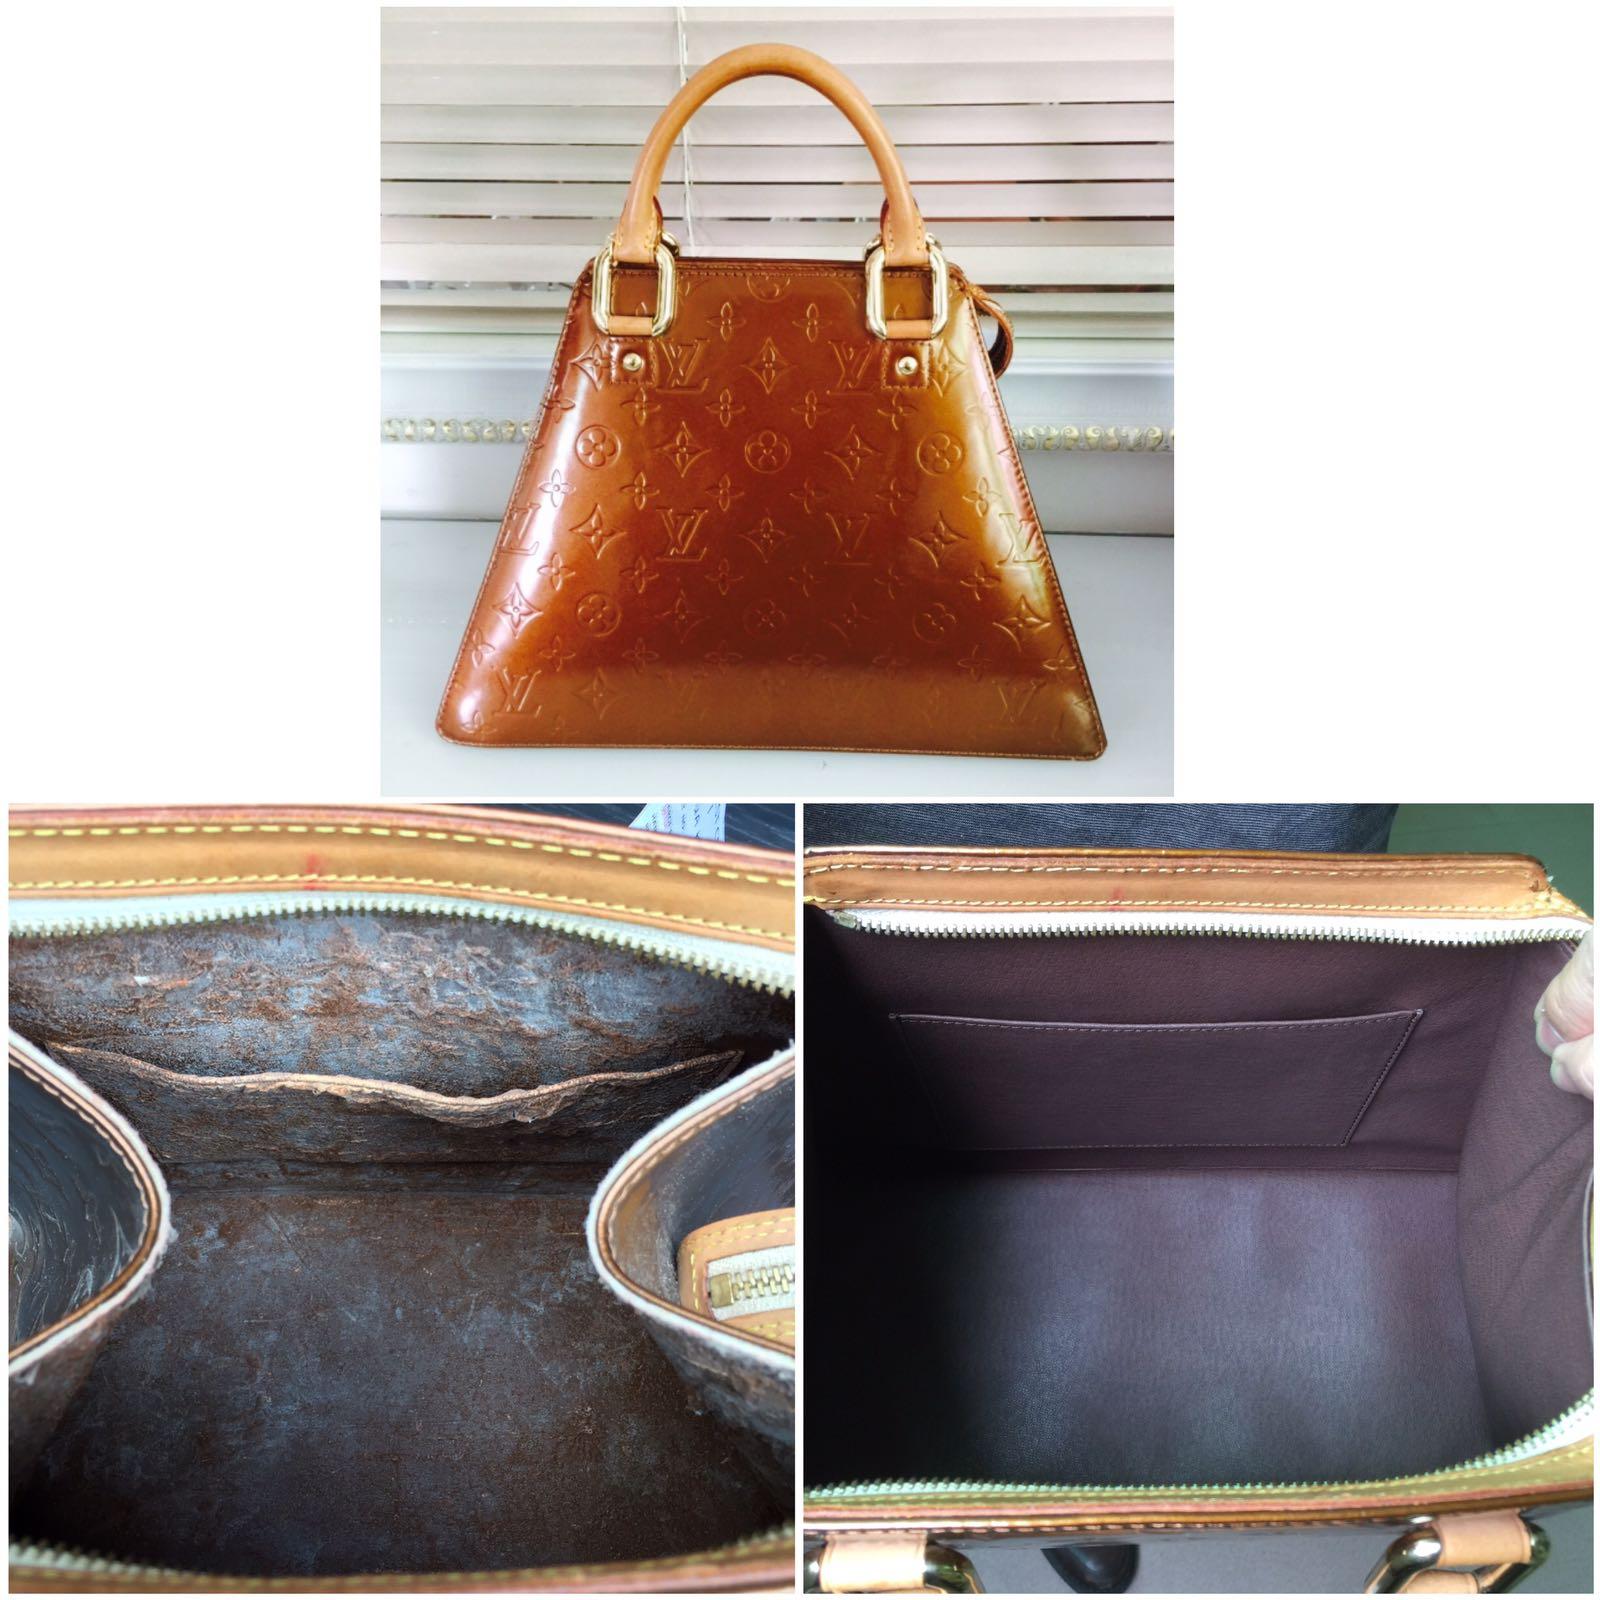 9461b1d8e5ac Inner Lining Replacment on LV Bag